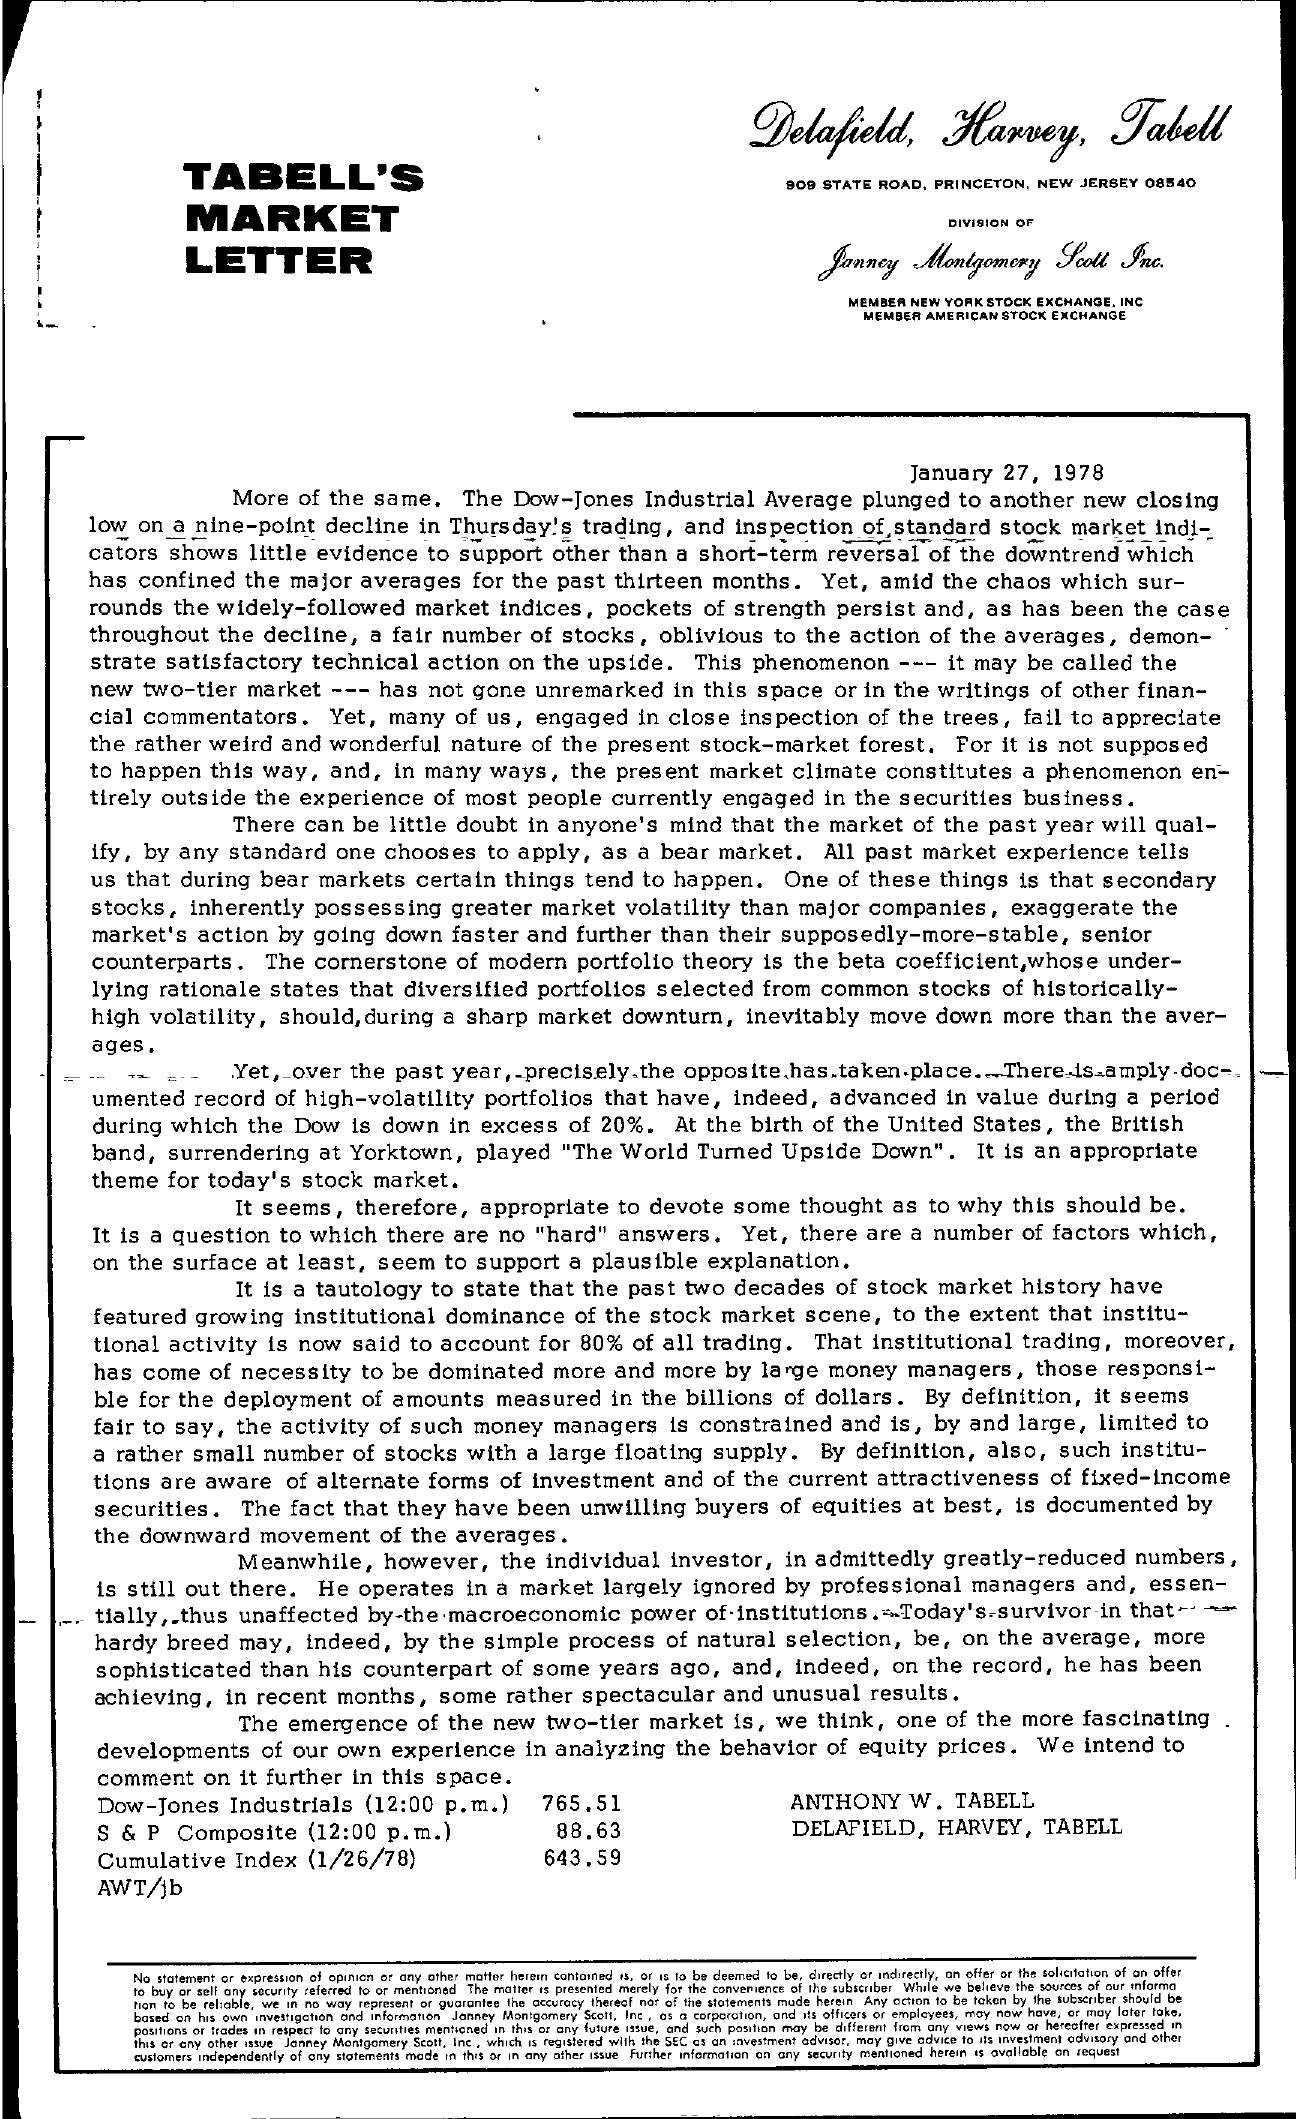 Tabell's Market Letter - January 27, 1978